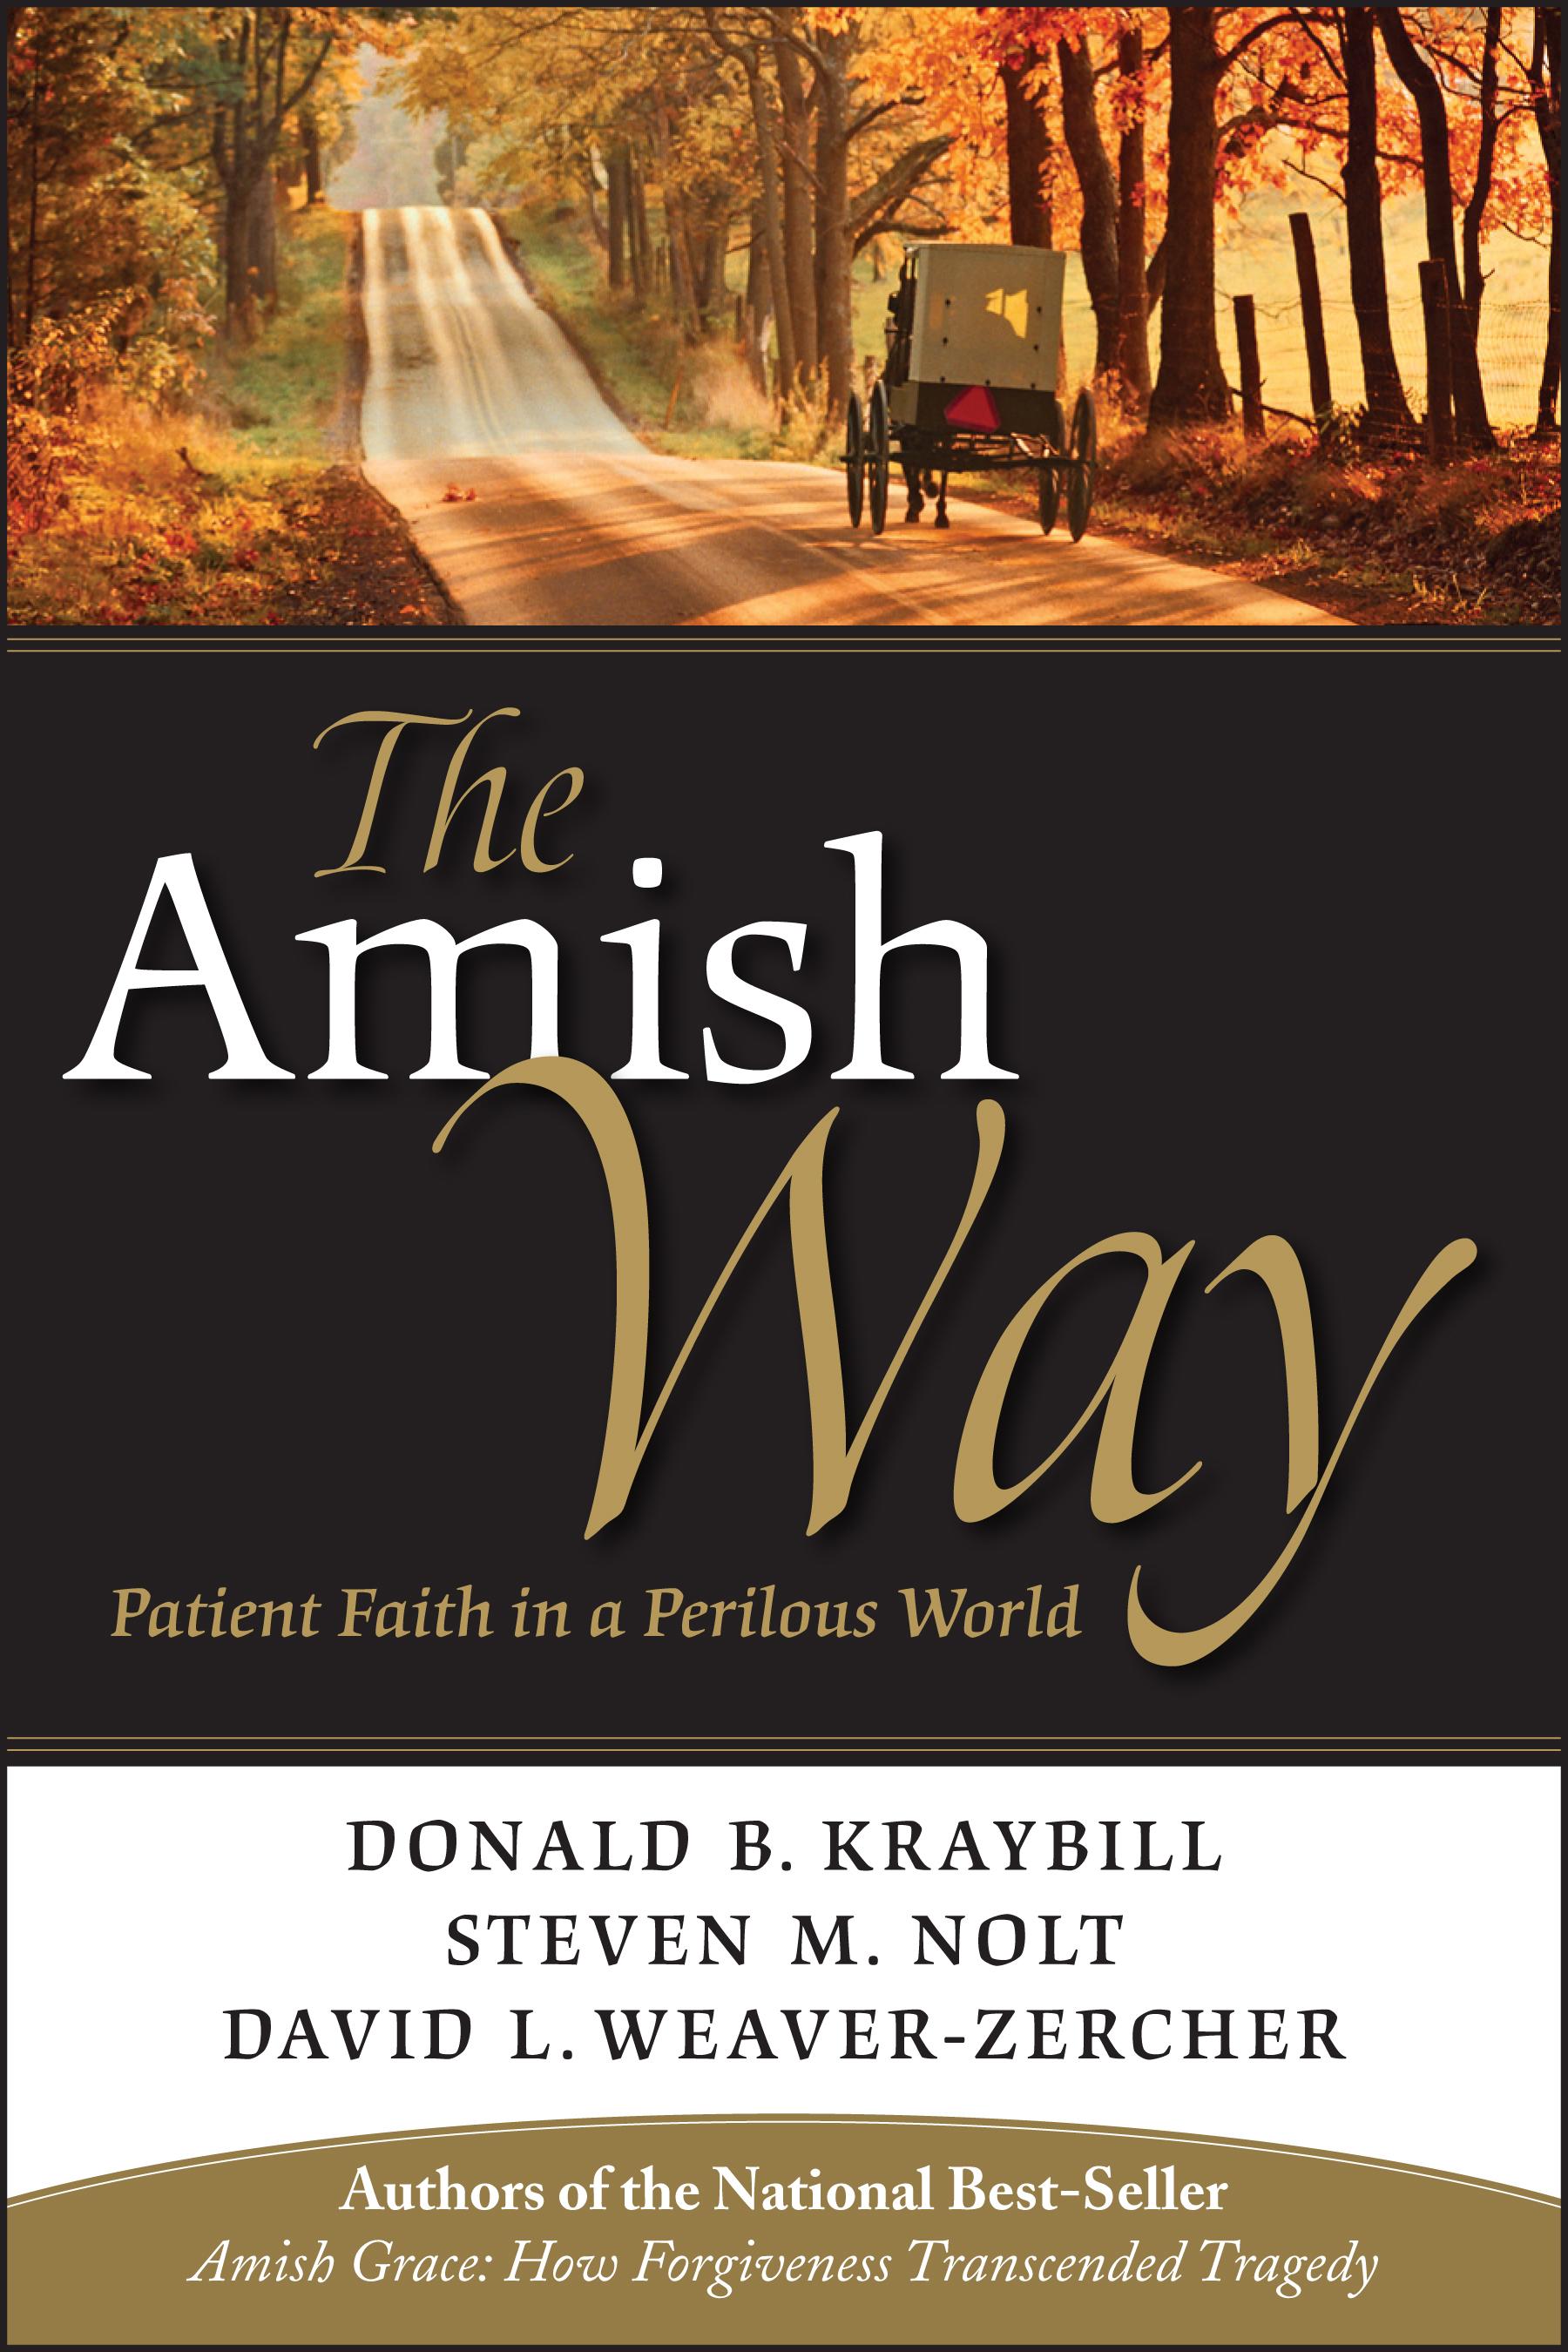 The amish ways